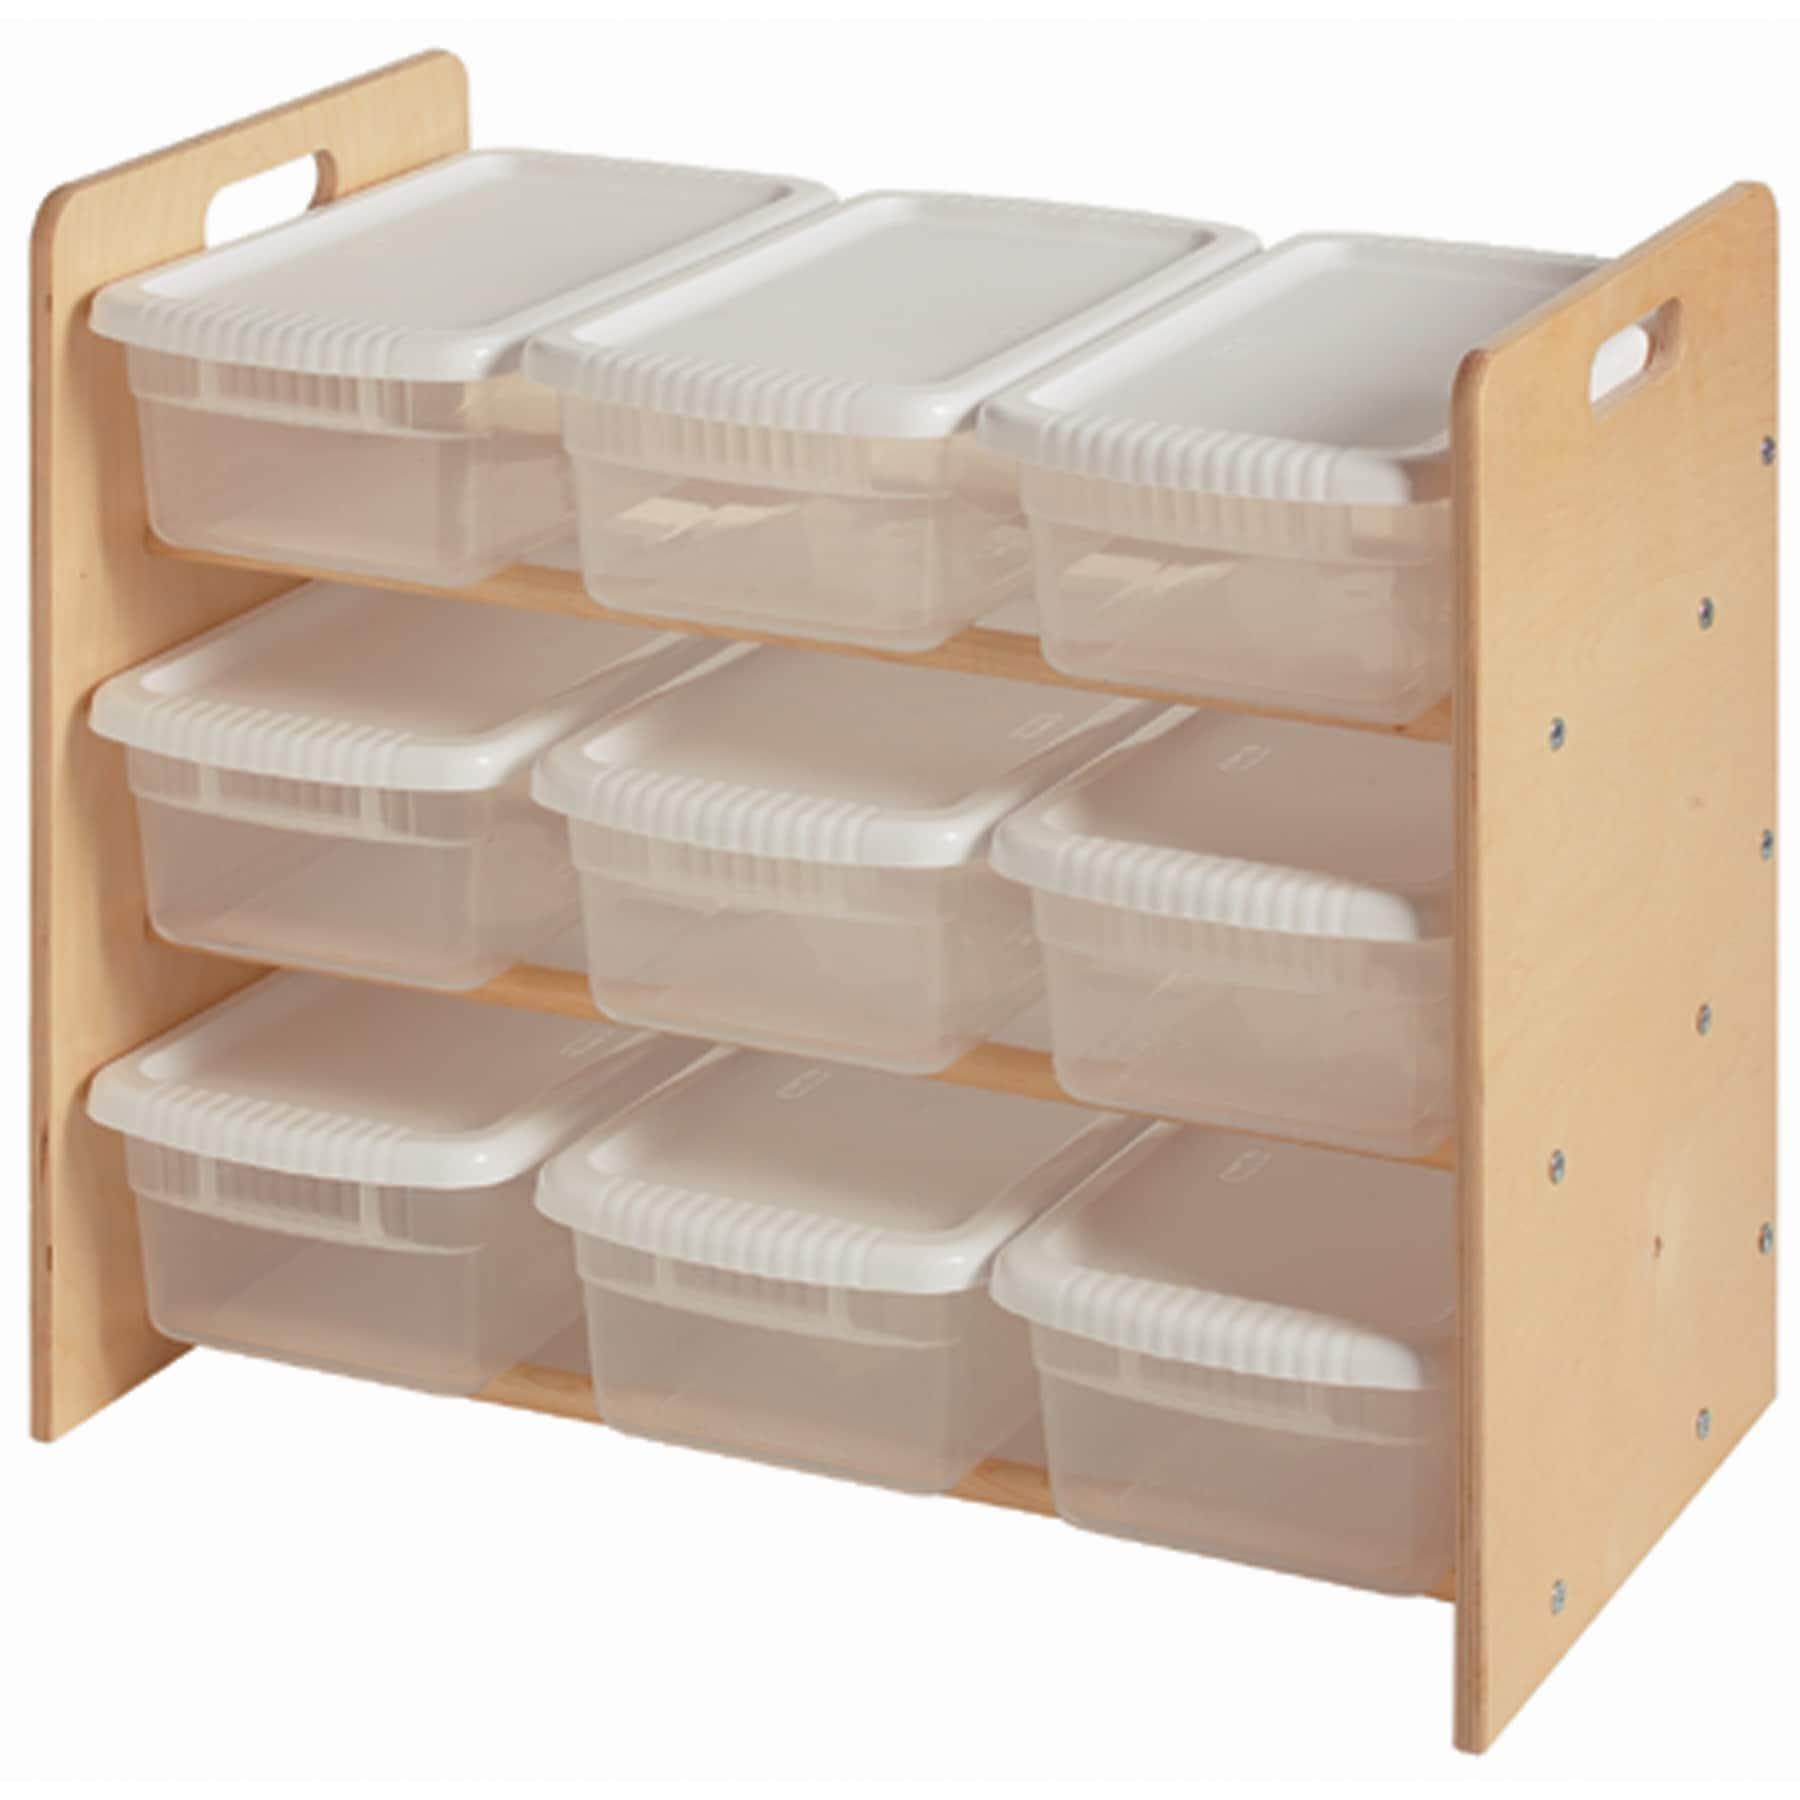 Little Colorado Plywood Nine-bin Toy Organizer (Unfinishe...